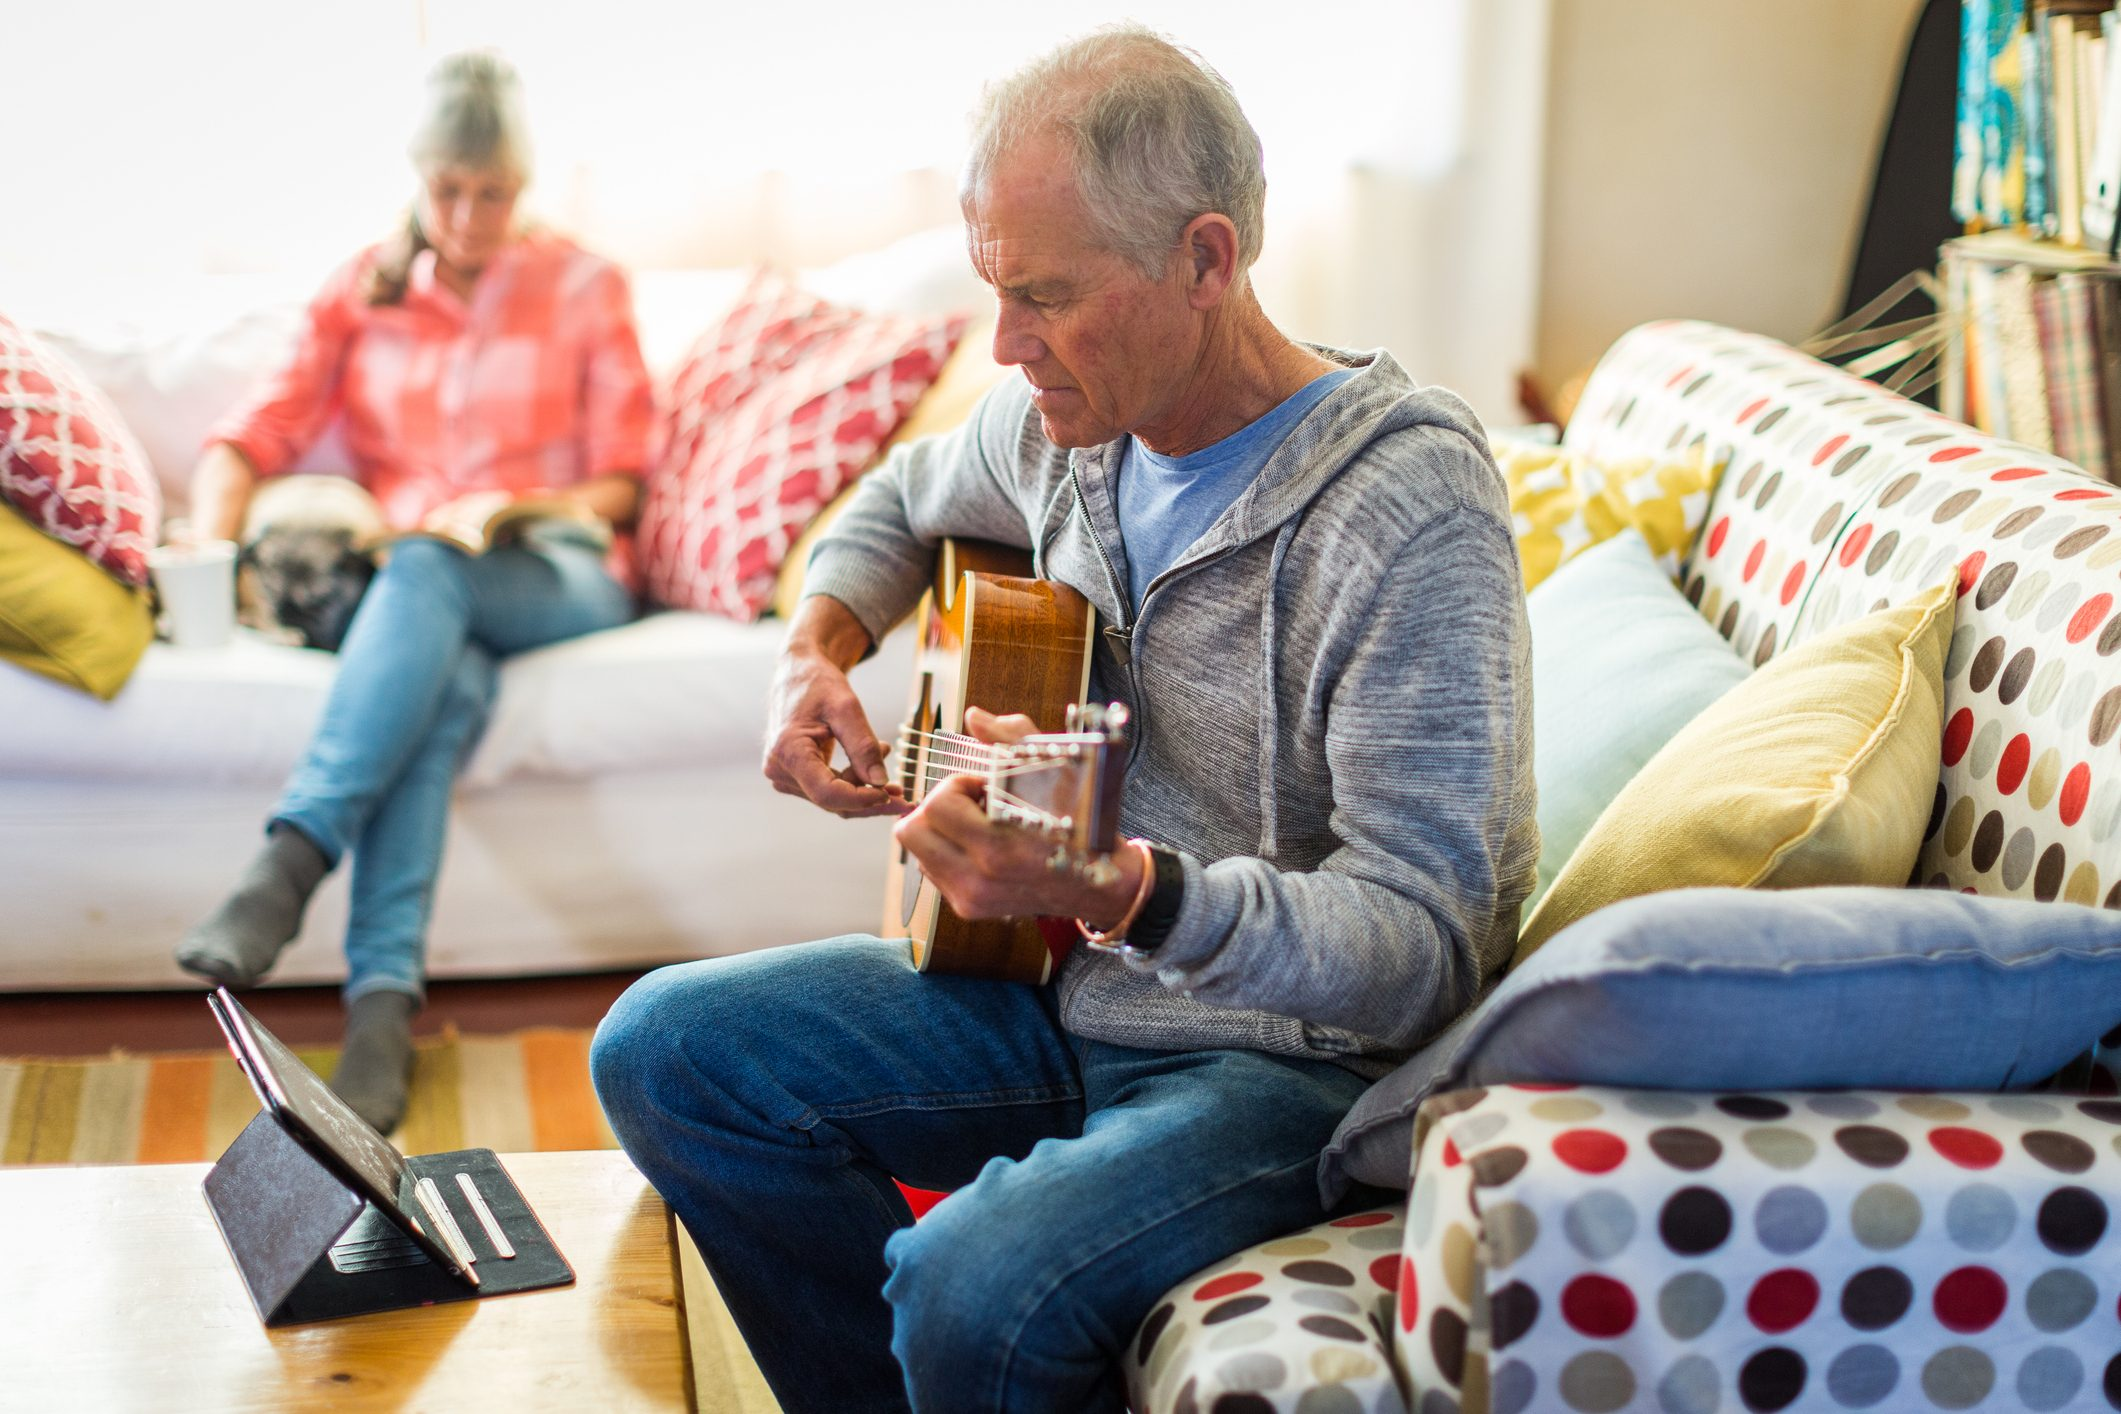 Senior man learning guitar by watching online tutorial